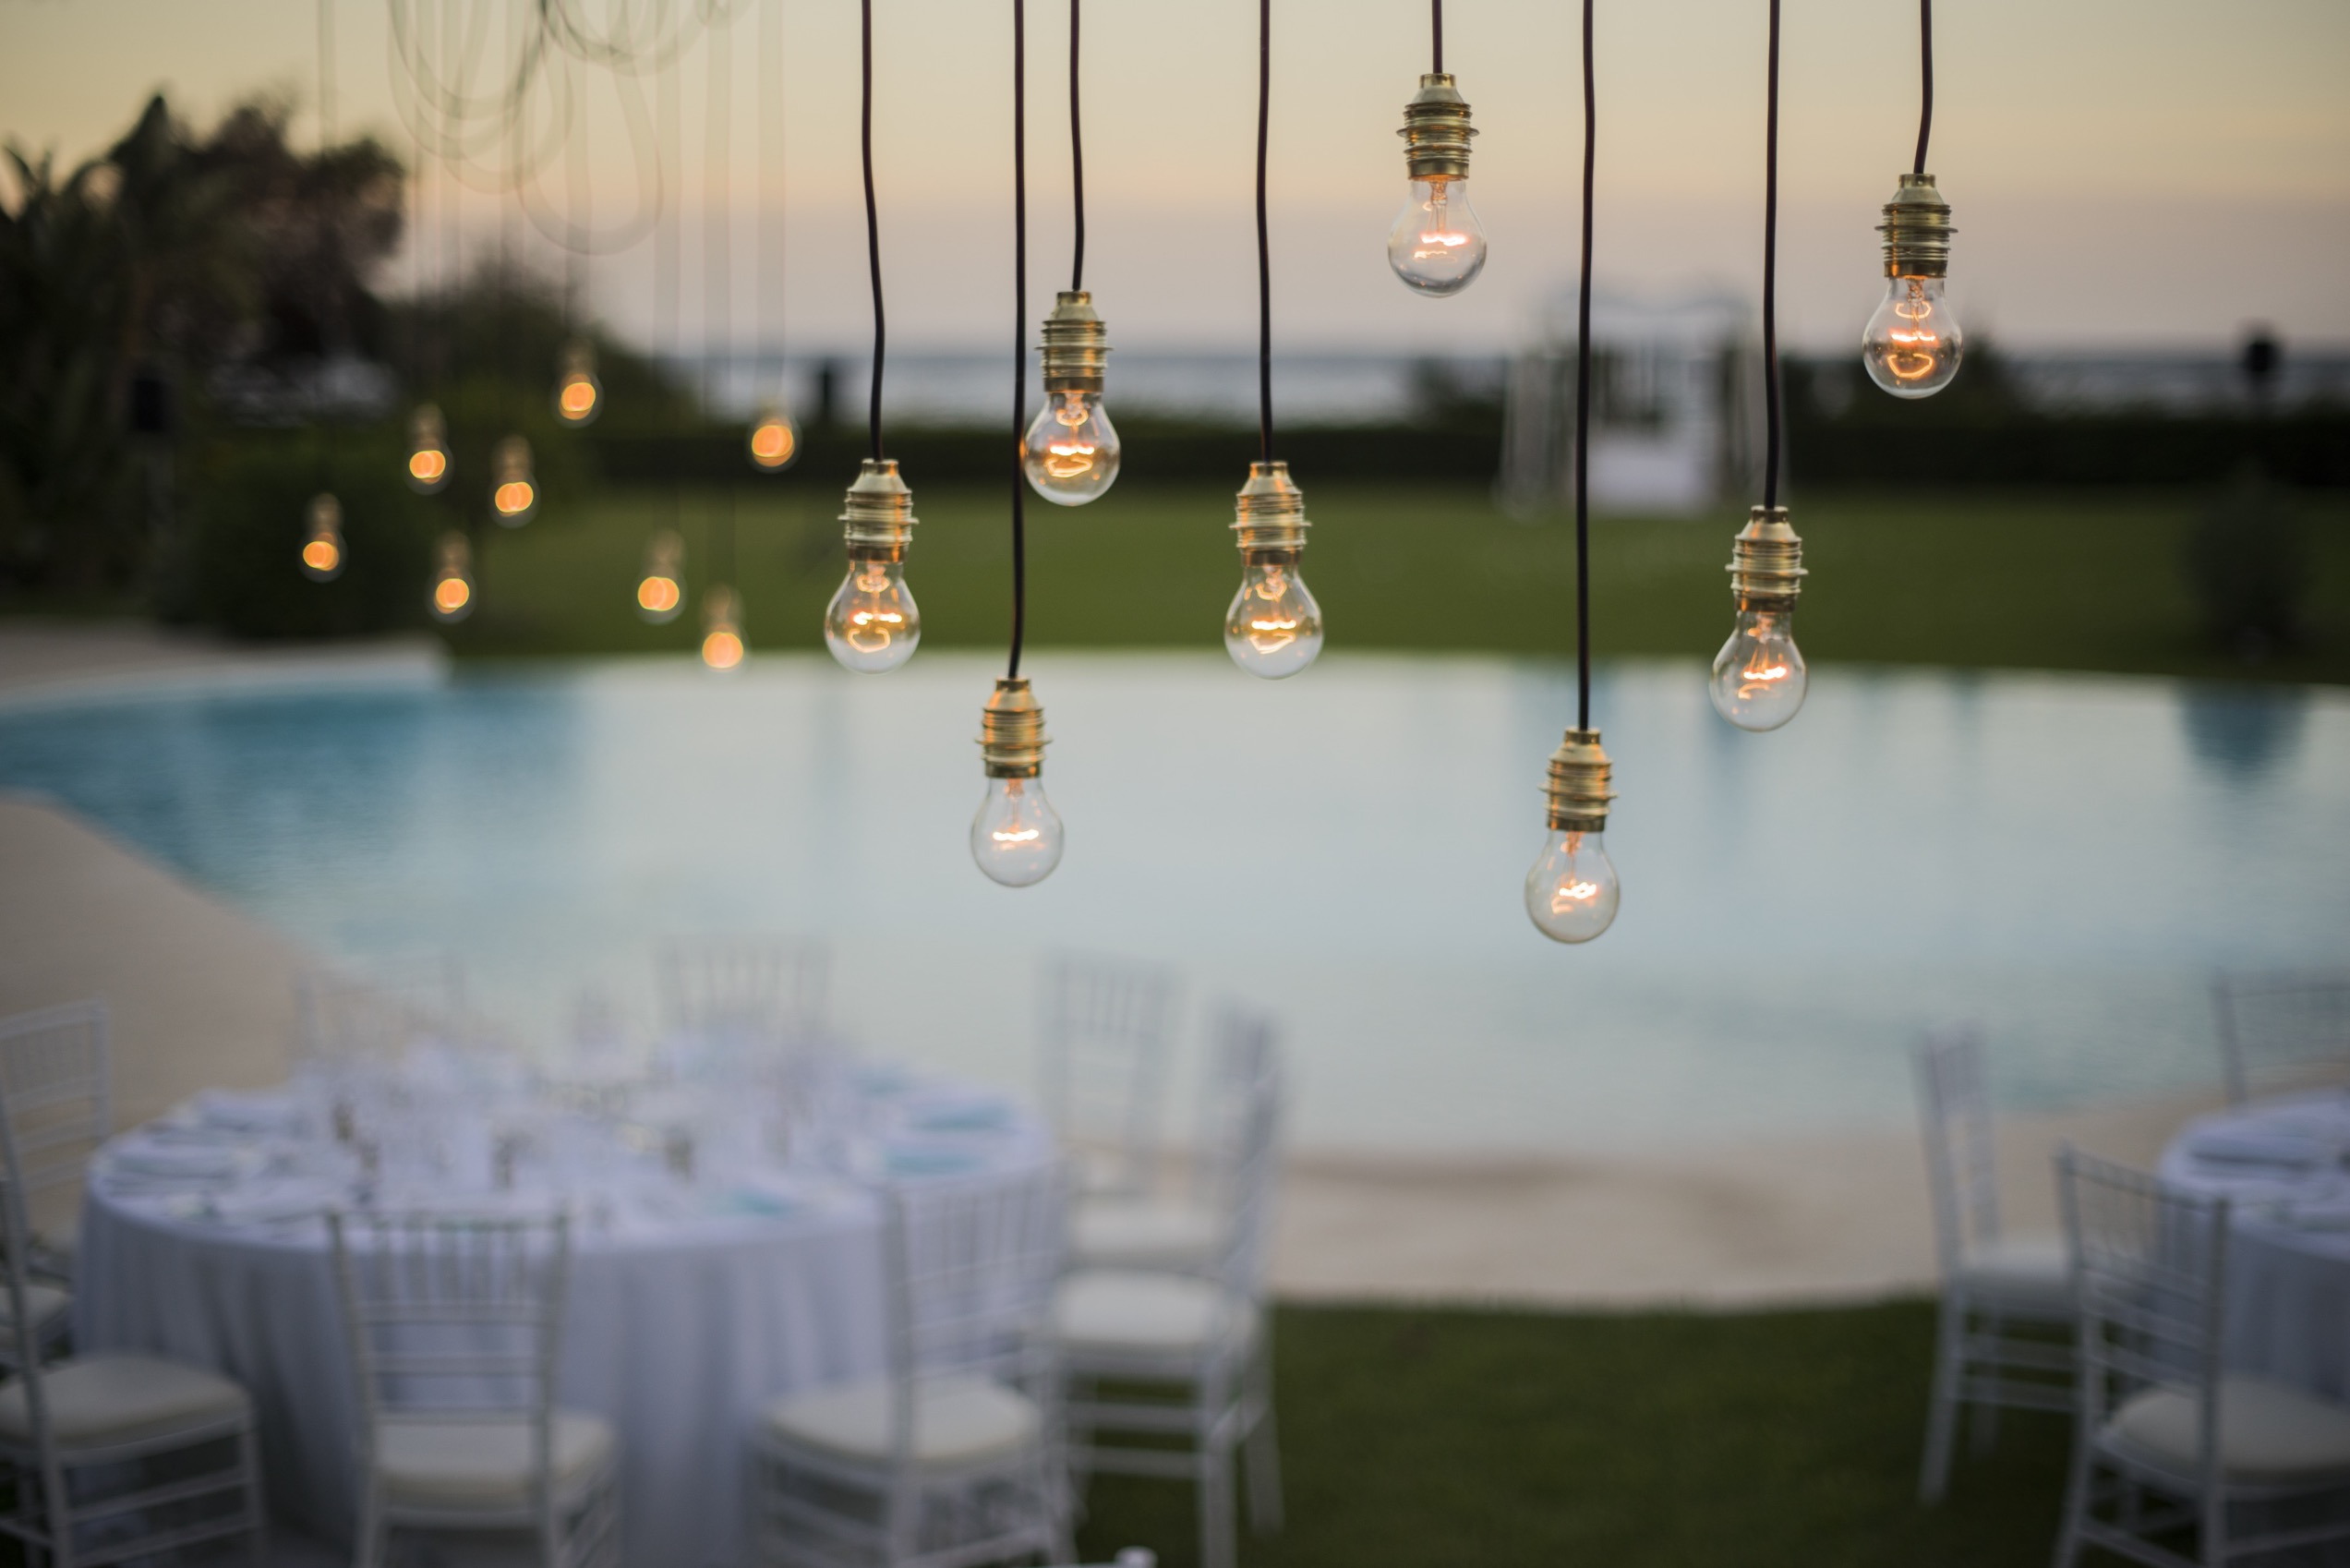 Si-Quiero-Wedding-Planner-By-Sira-Antequera-Bodas-Málaga-Marbella-Miami- Nicole-Guille-8